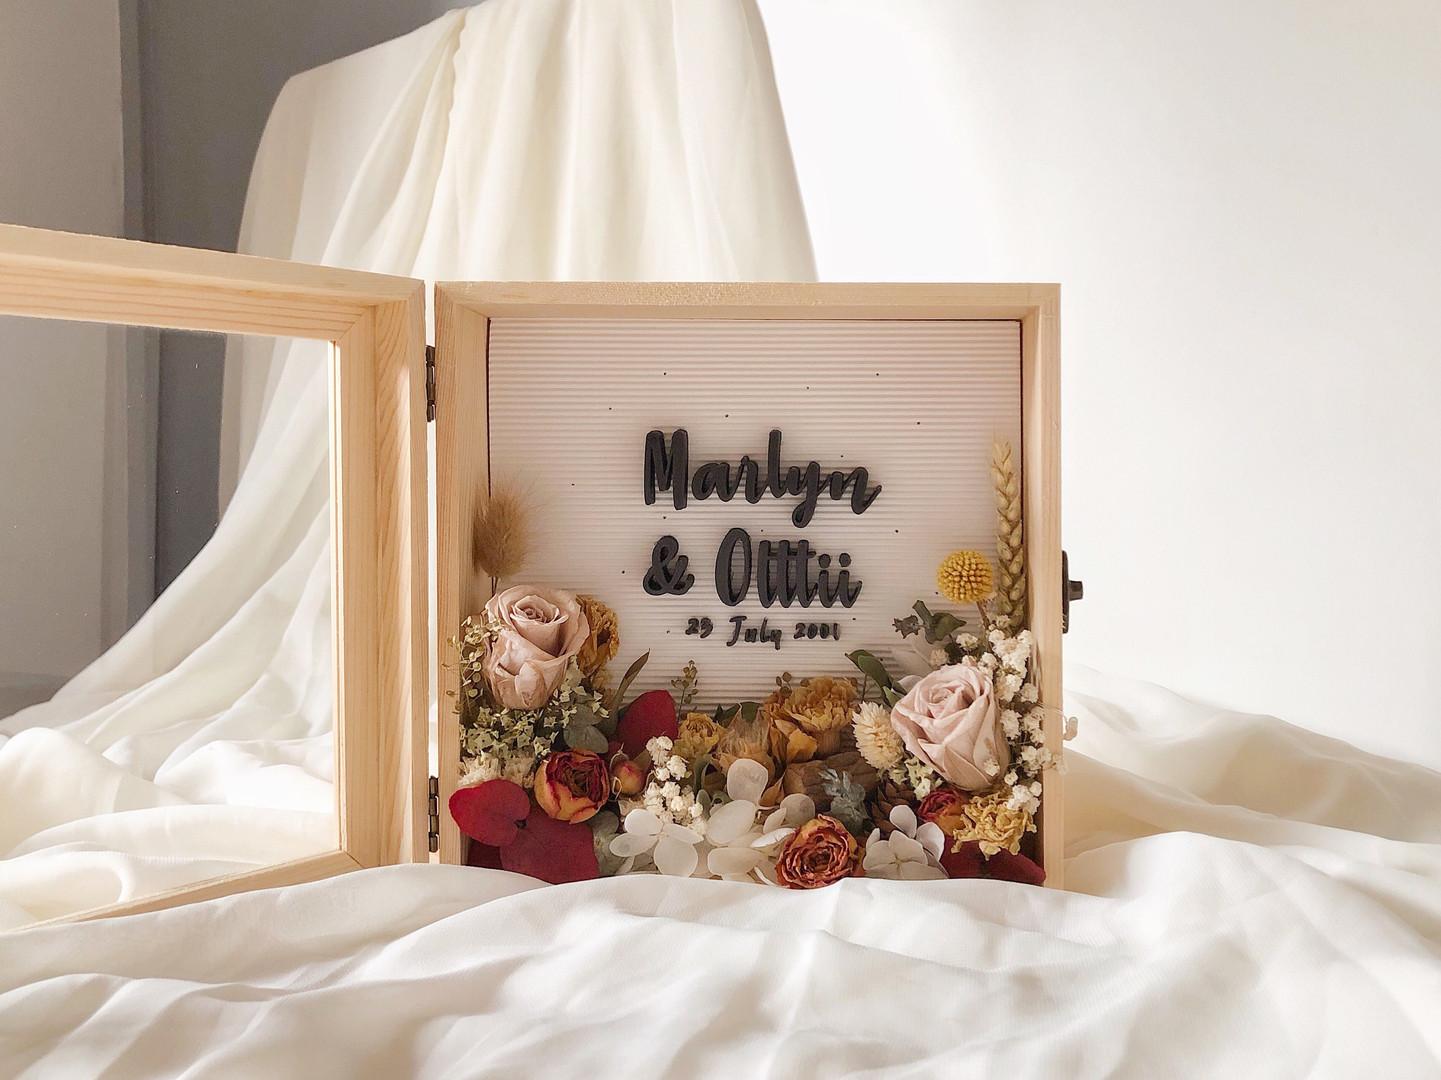 Customised Flower Box (Marlyn & Olttii)